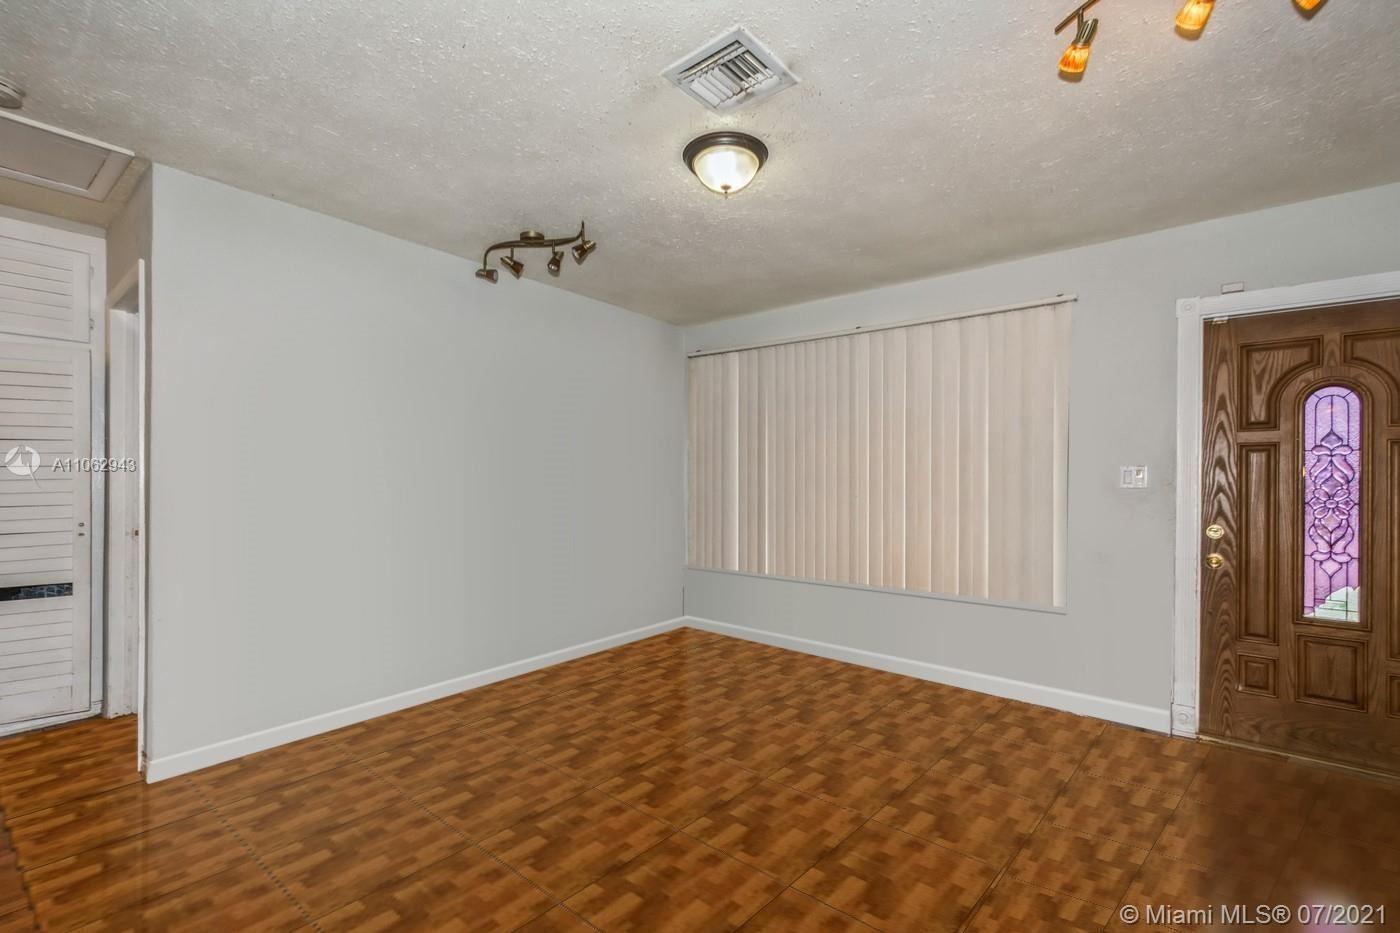 Photo of 3161 NW 14th St, Lauderhill, FL 33311 (MLS # A11062943)